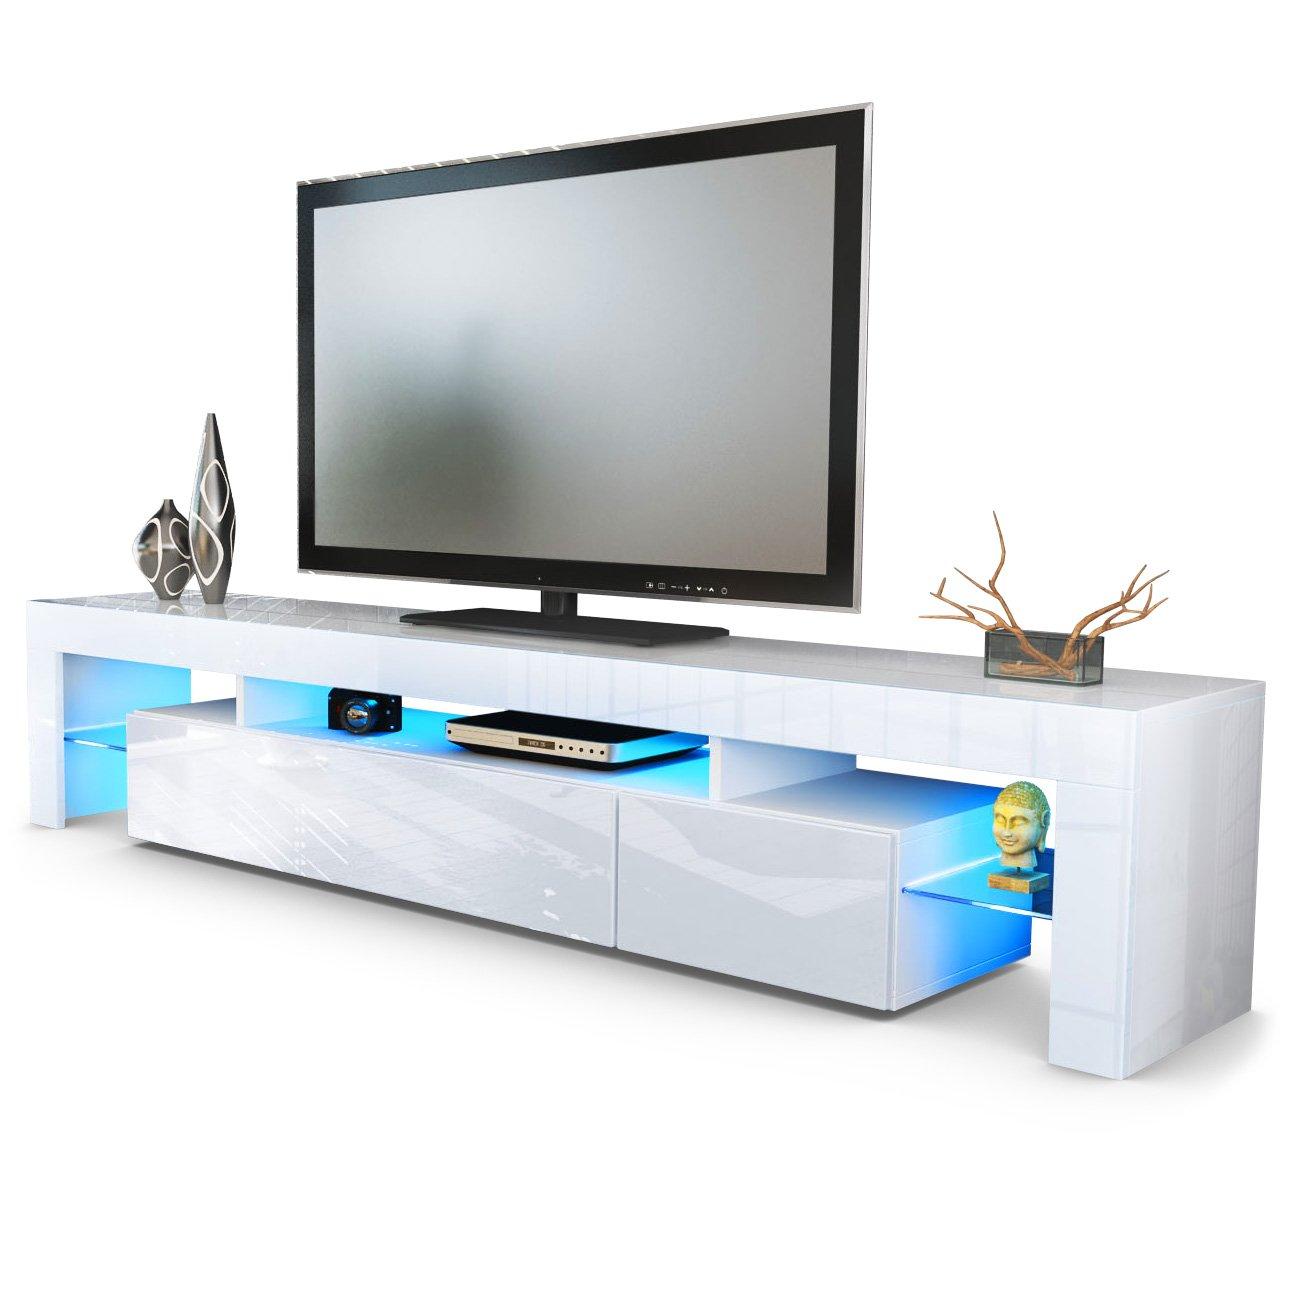 Interesting Cool Awesome Tv Board Lowboard Lima V In Wei Grau Hochglanz  Vladon Amazonde Kche U Haushalt With Hochglanz Brett With Hnge Tv Board  With Tv ...